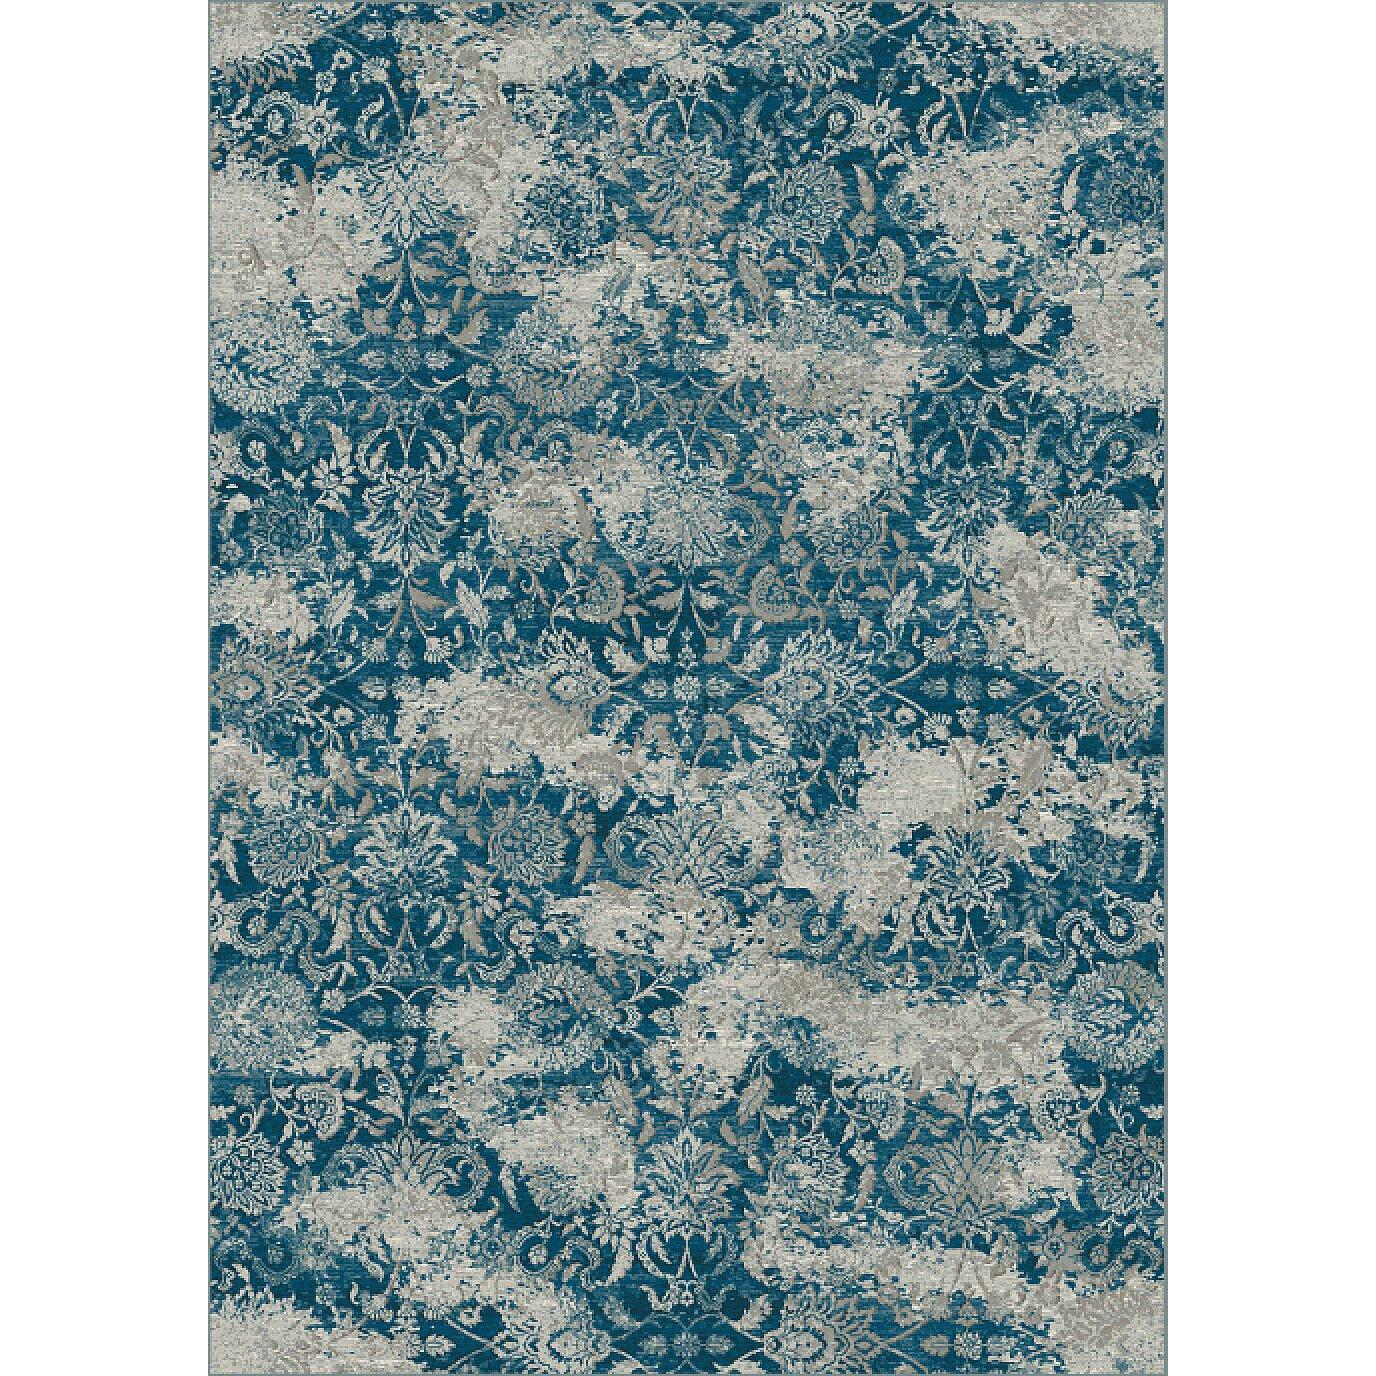 dynamic rugs regal gray blue area rug reviews wayfair. Black Bedroom Furniture Sets. Home Design Ideas